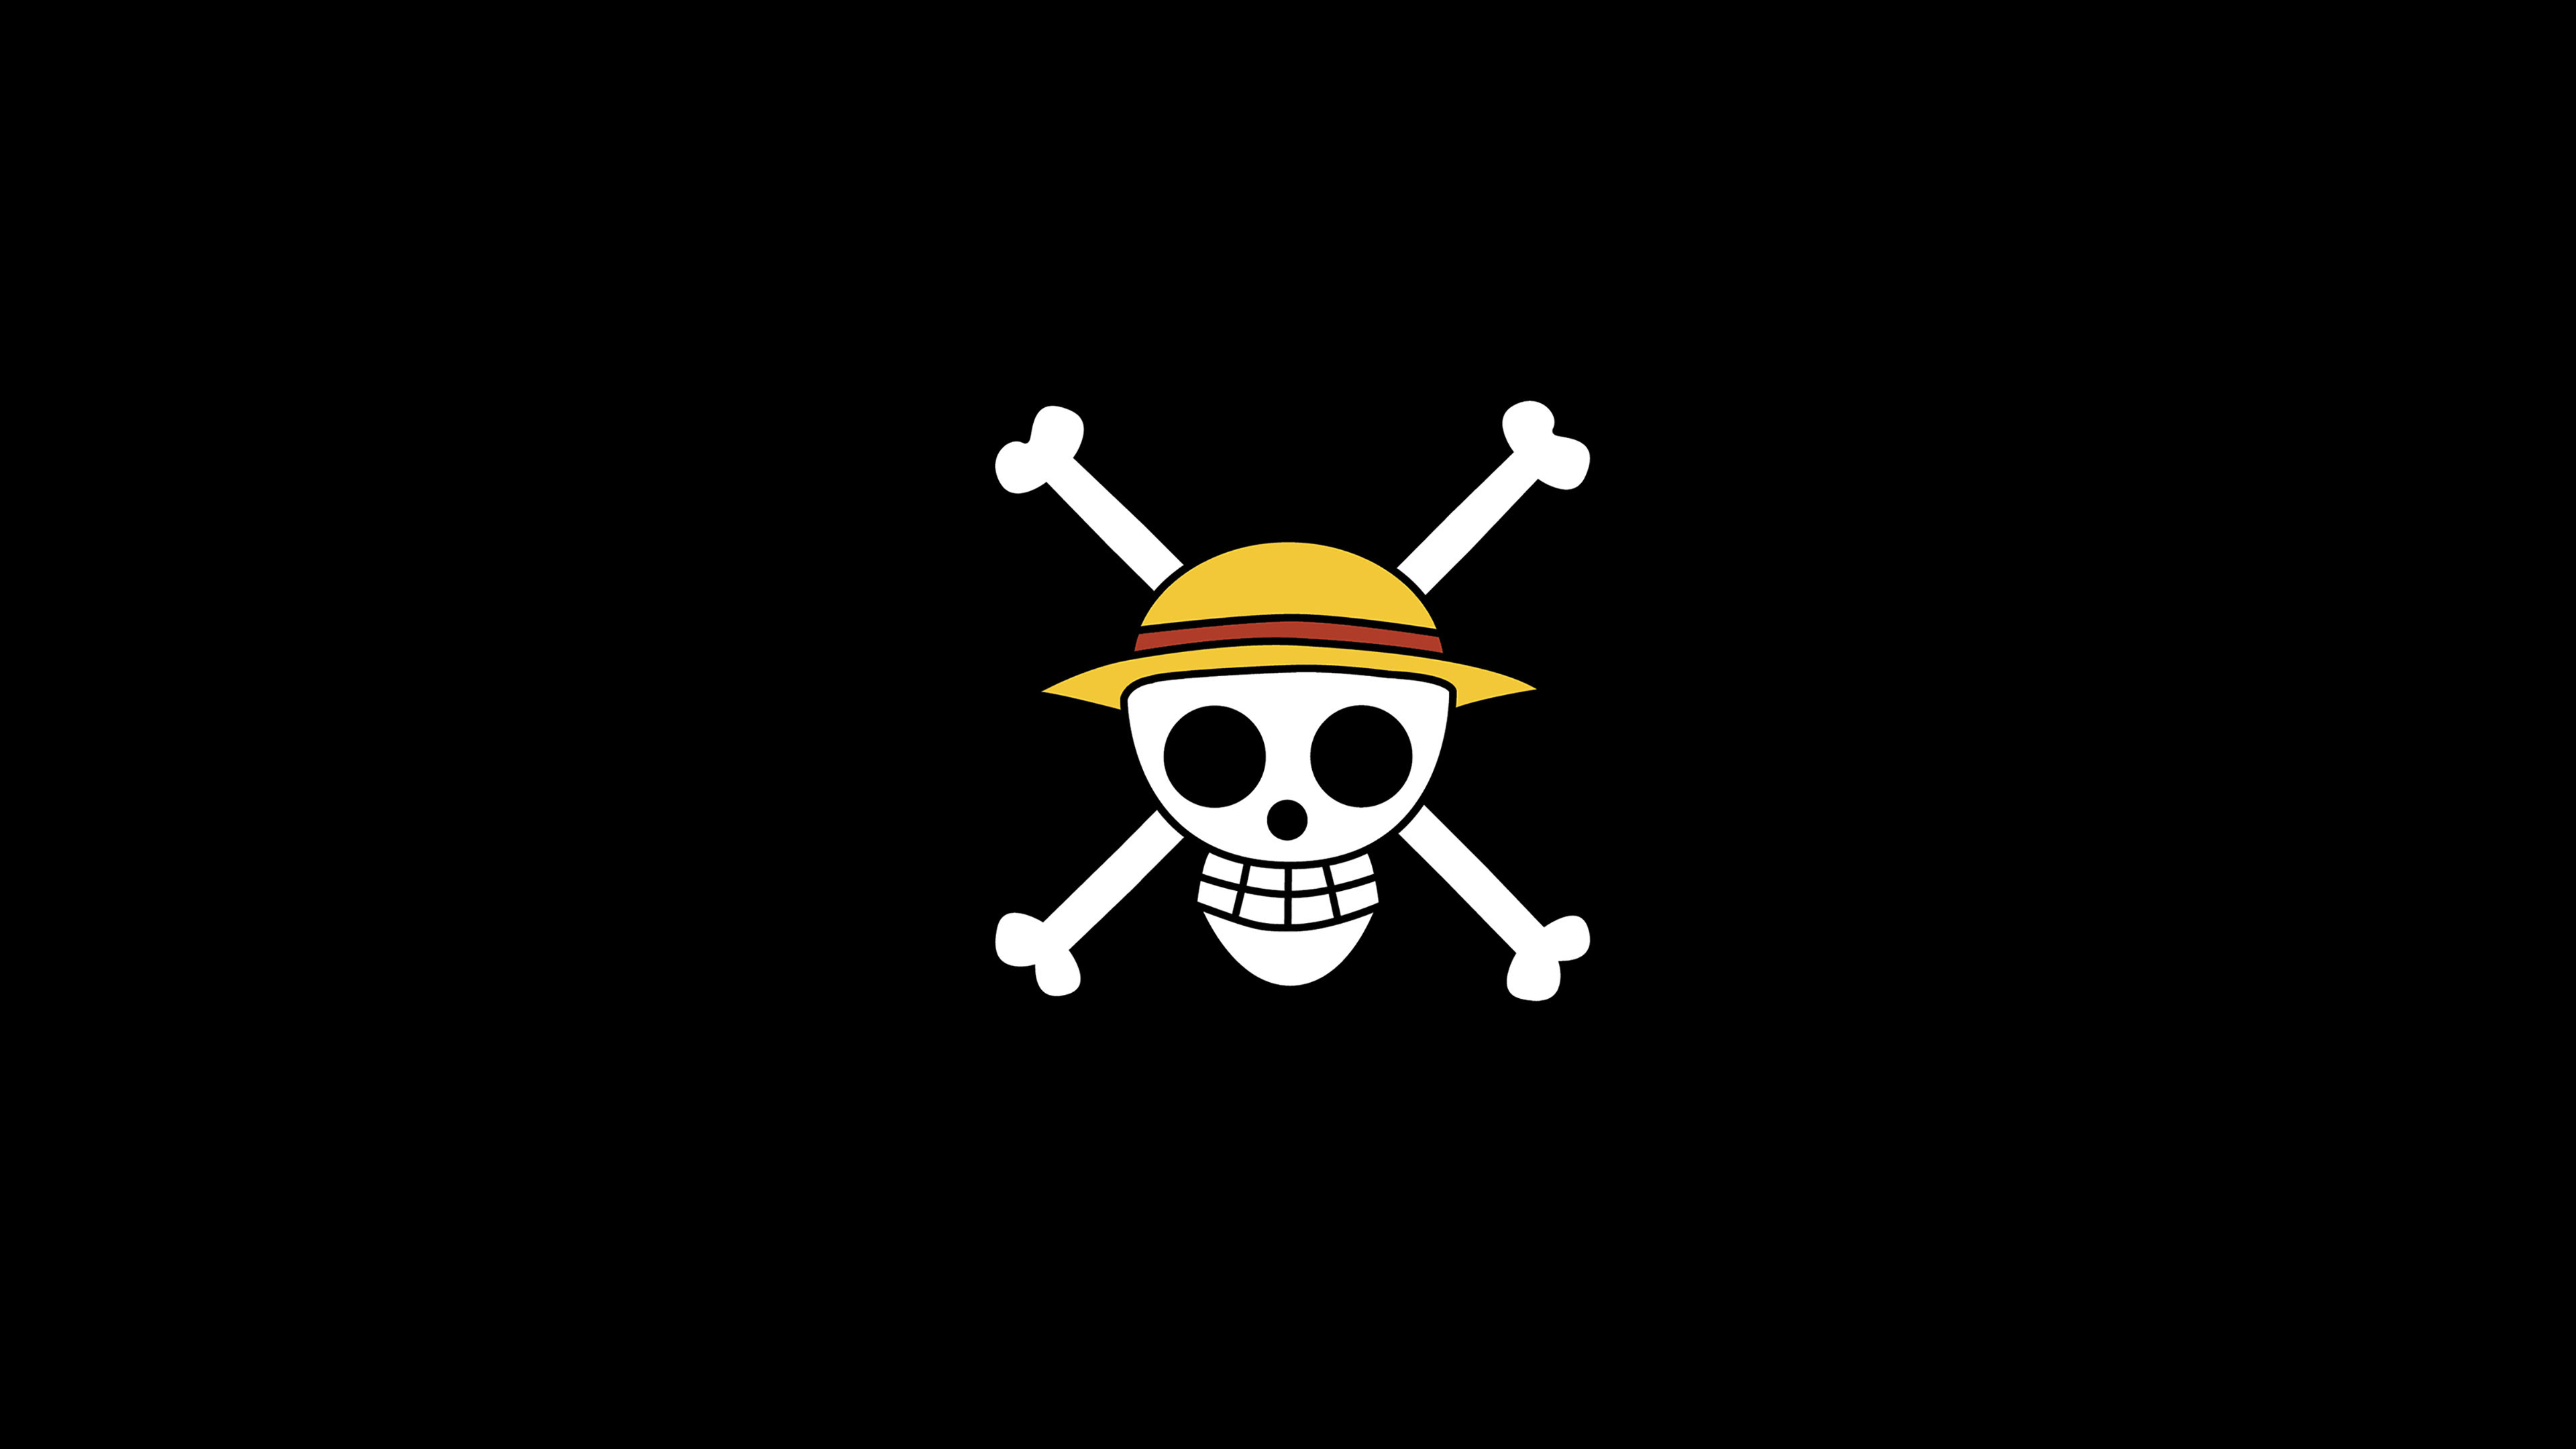 One Piece Iphone X Wallpaper Wallpaper For Desktop Laptop Ad49 One Piece Logo Art